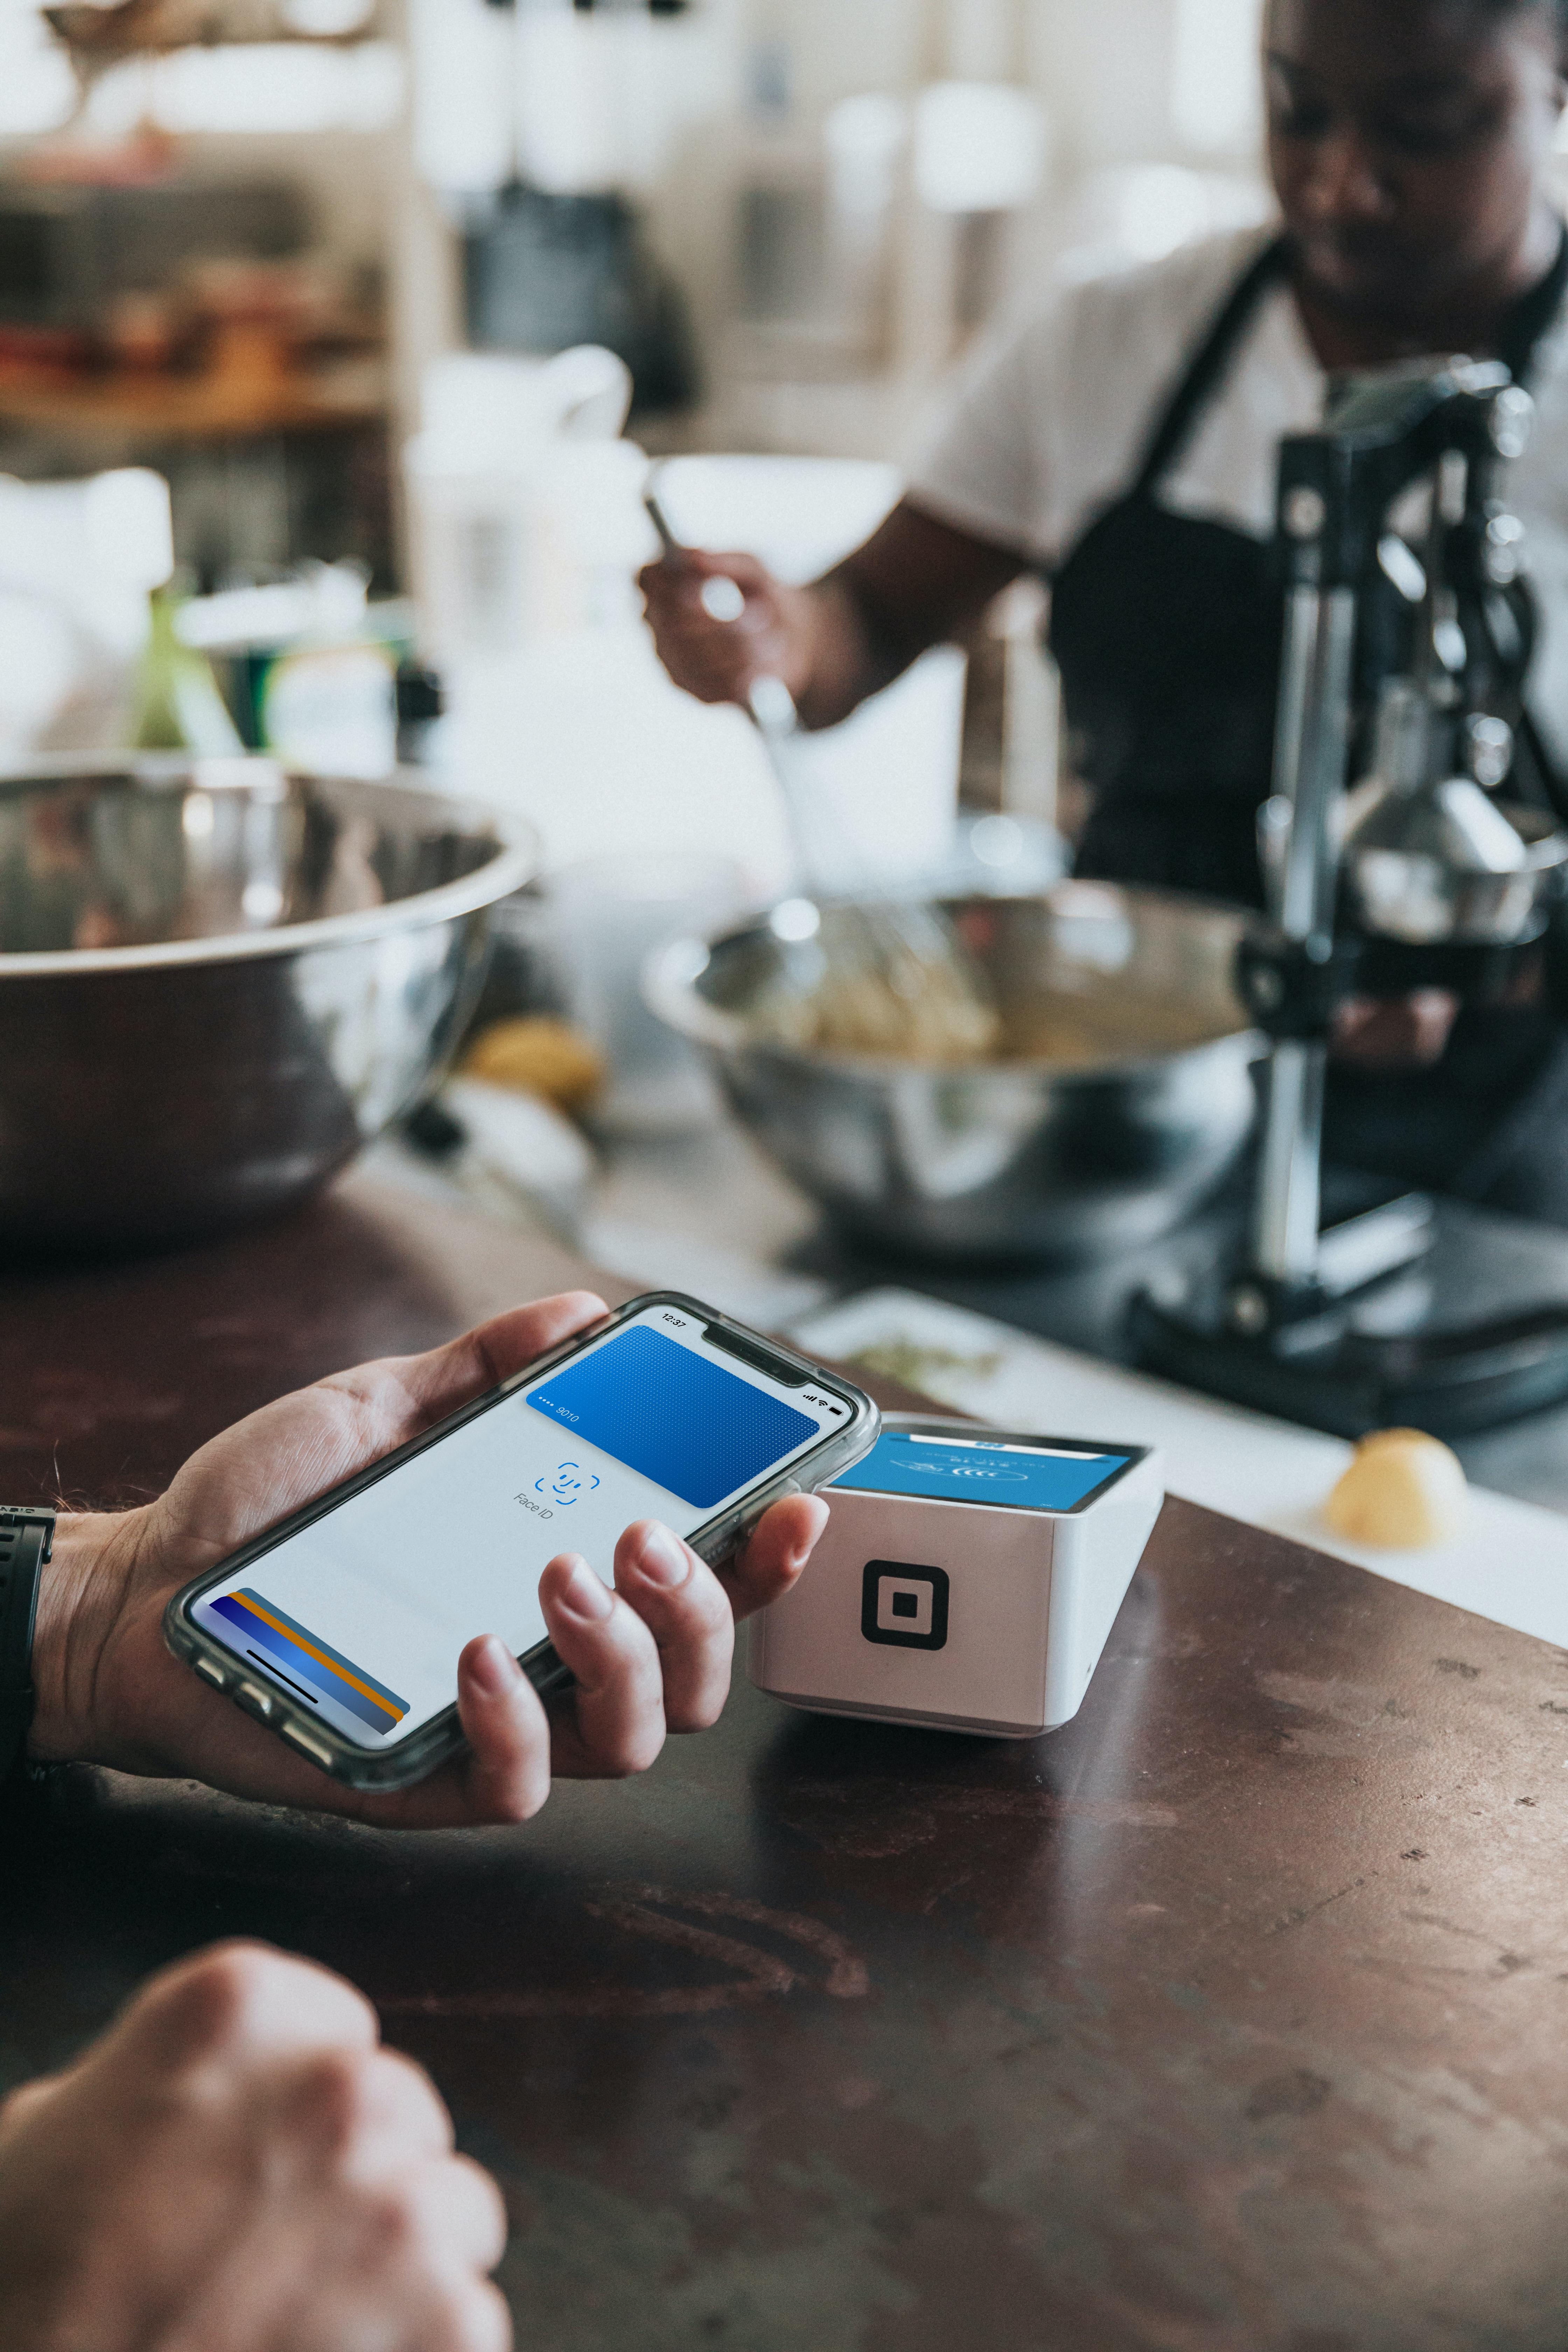 Wizpay Mobile banking, ewallet, POS, inventory management app Shop